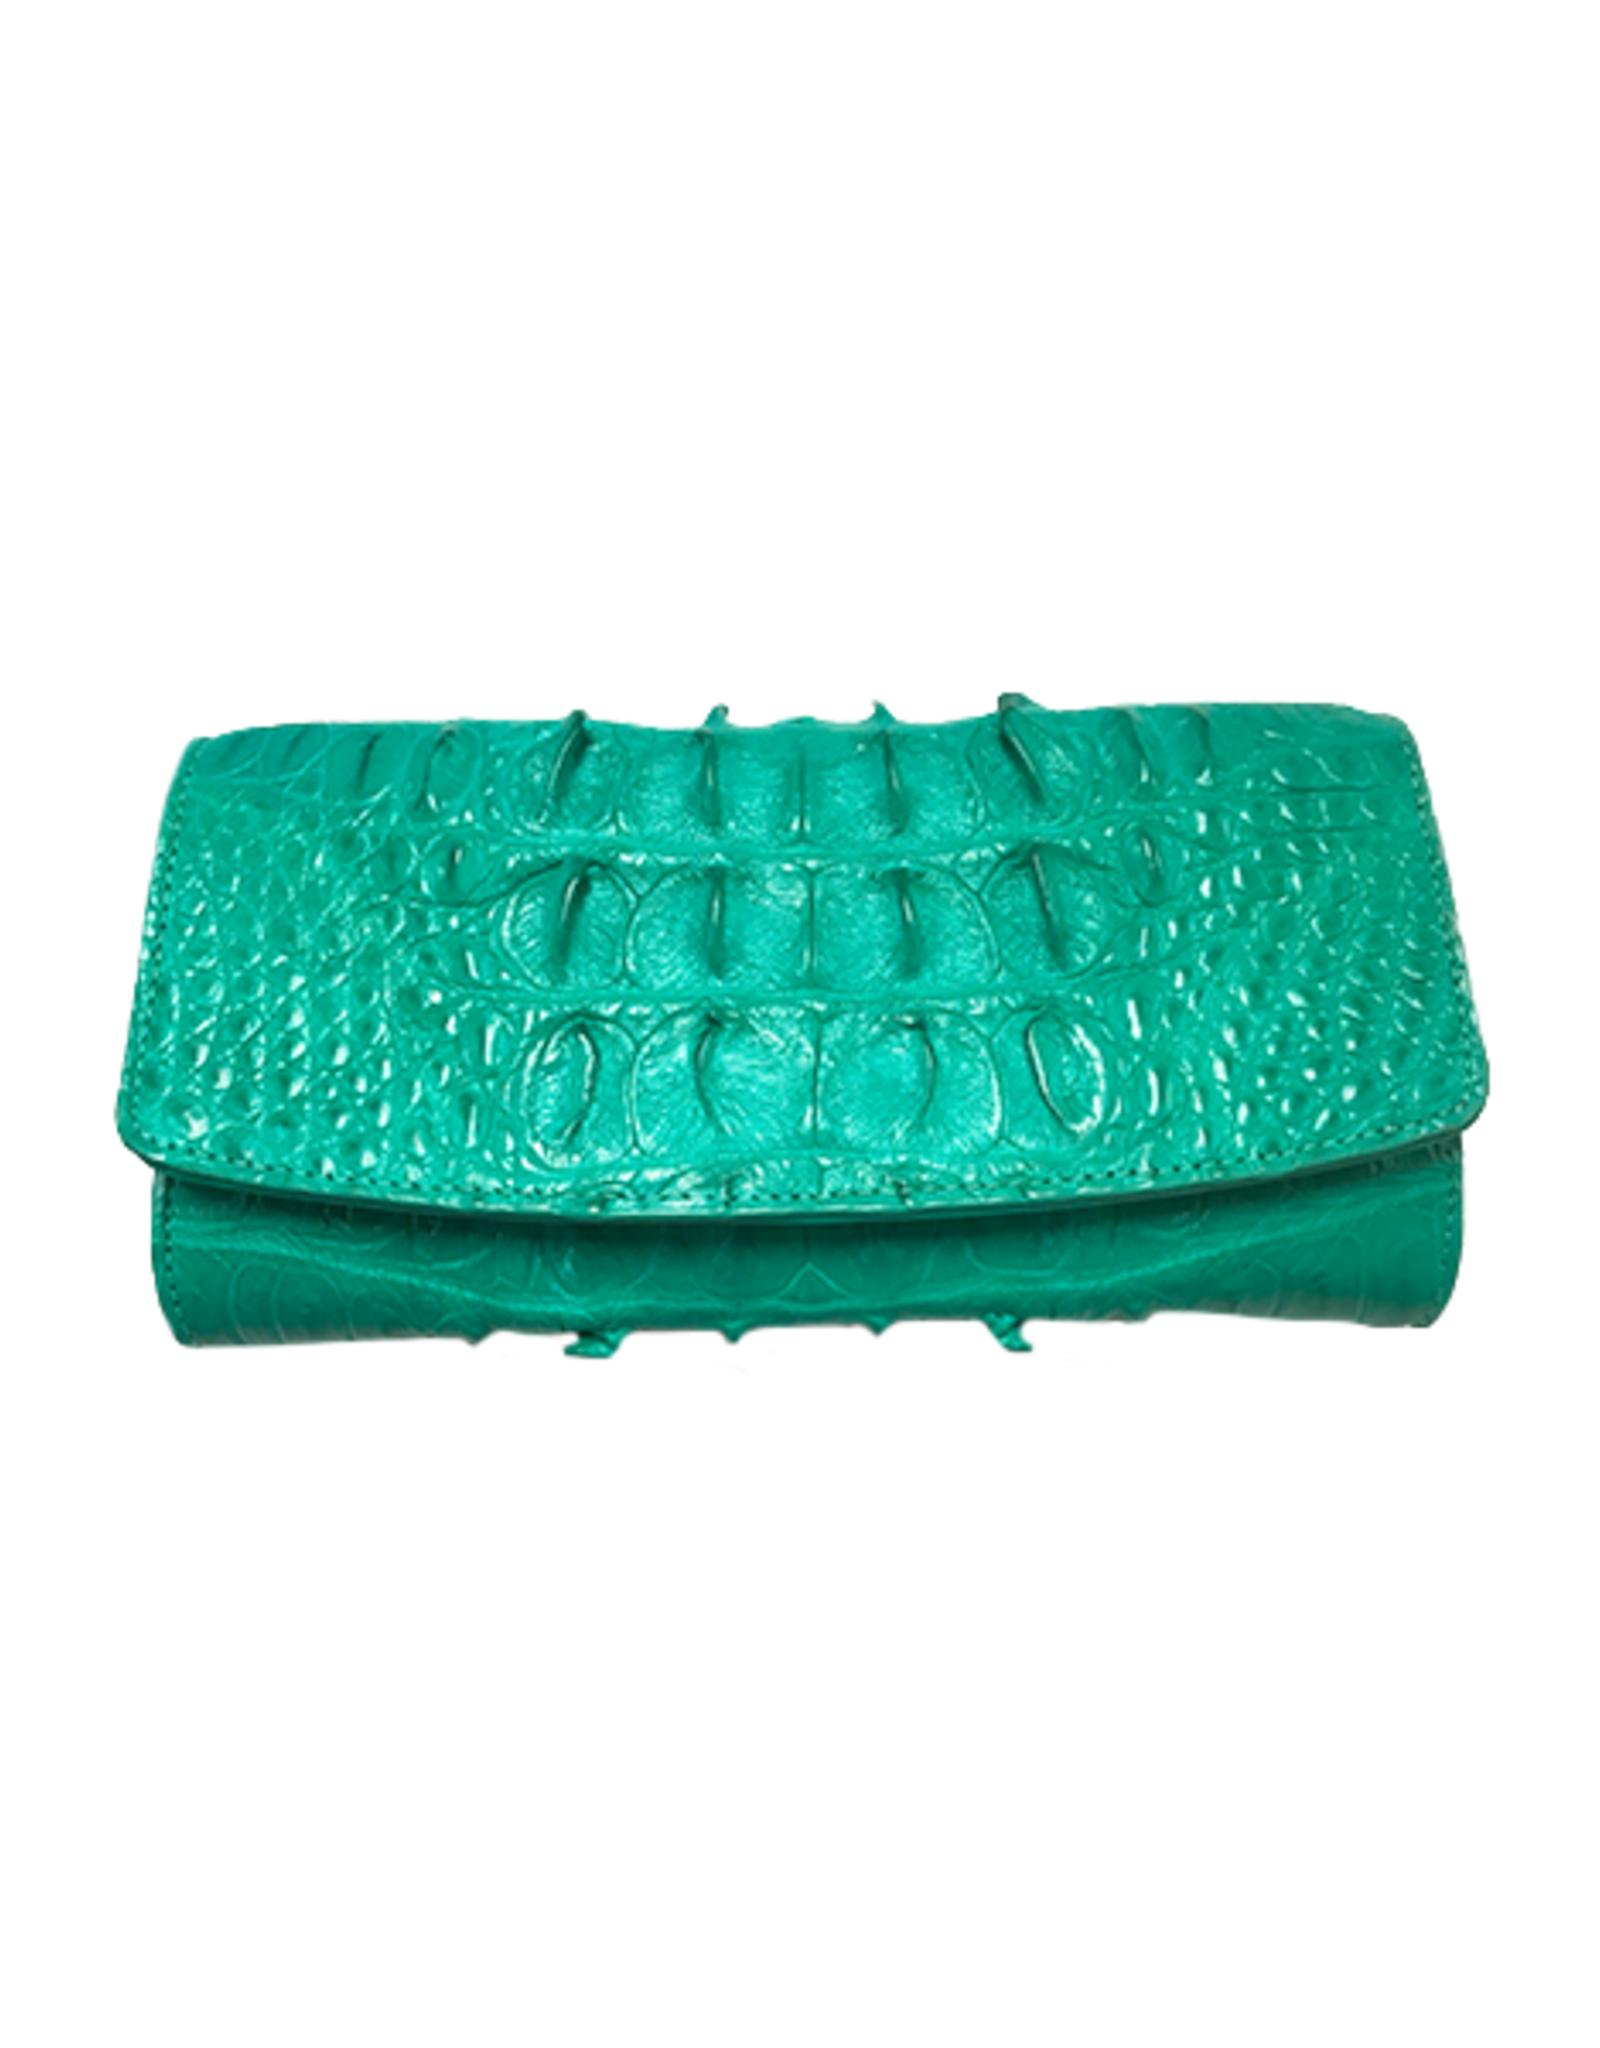 Crocodile & Stingray Products Ladies Crocodile Wallet in Green